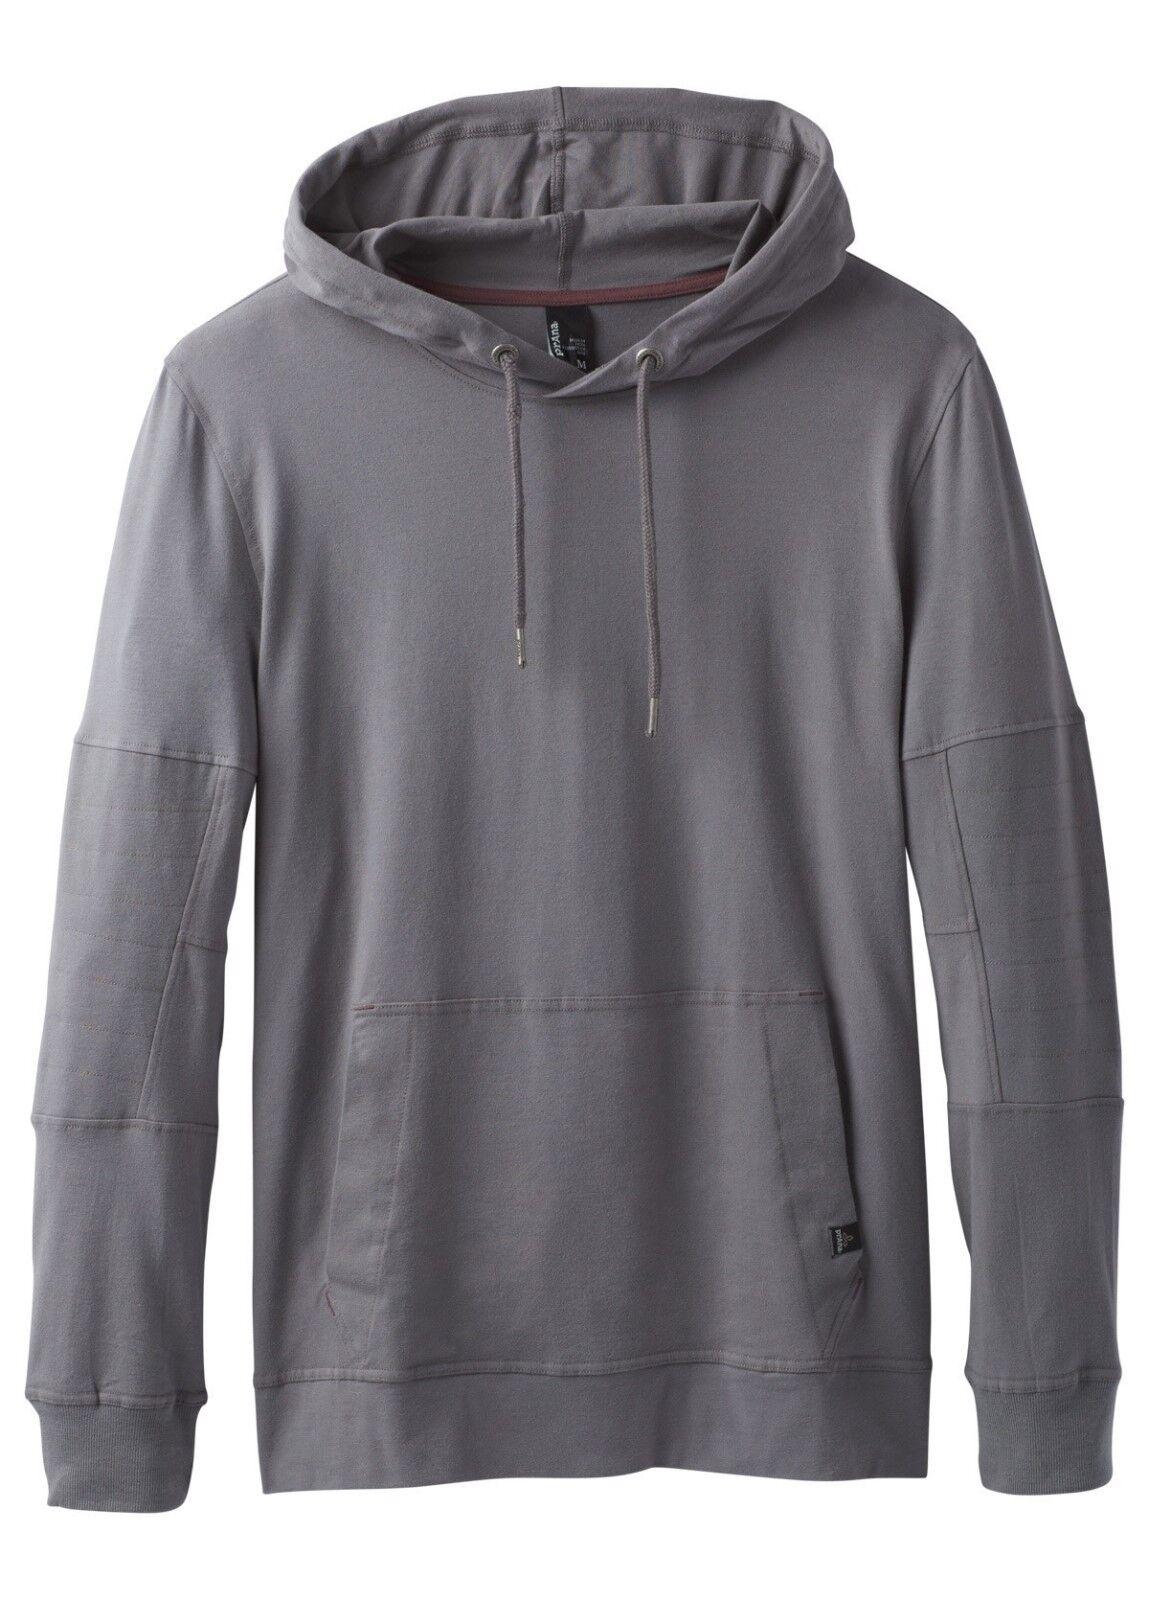 Prana Sector Hoodie, Hoody Sweater for Men, Gravel